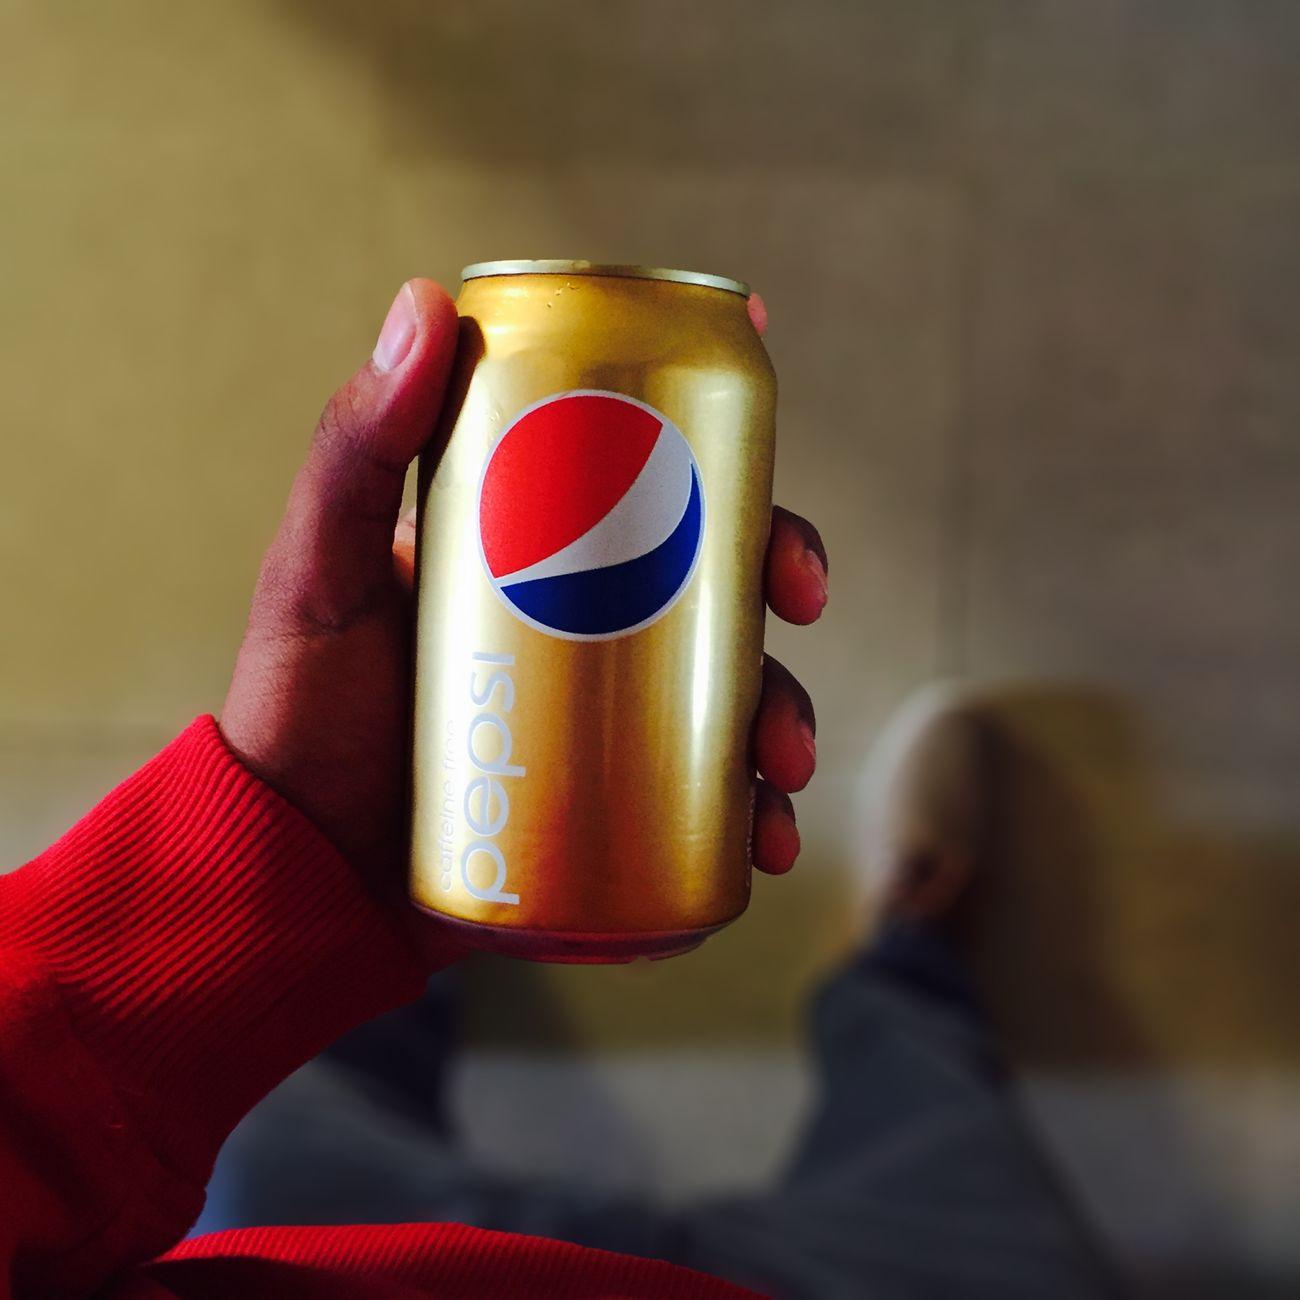 Pepsi Taking Photos تصويري  قولدن بيبسي ?